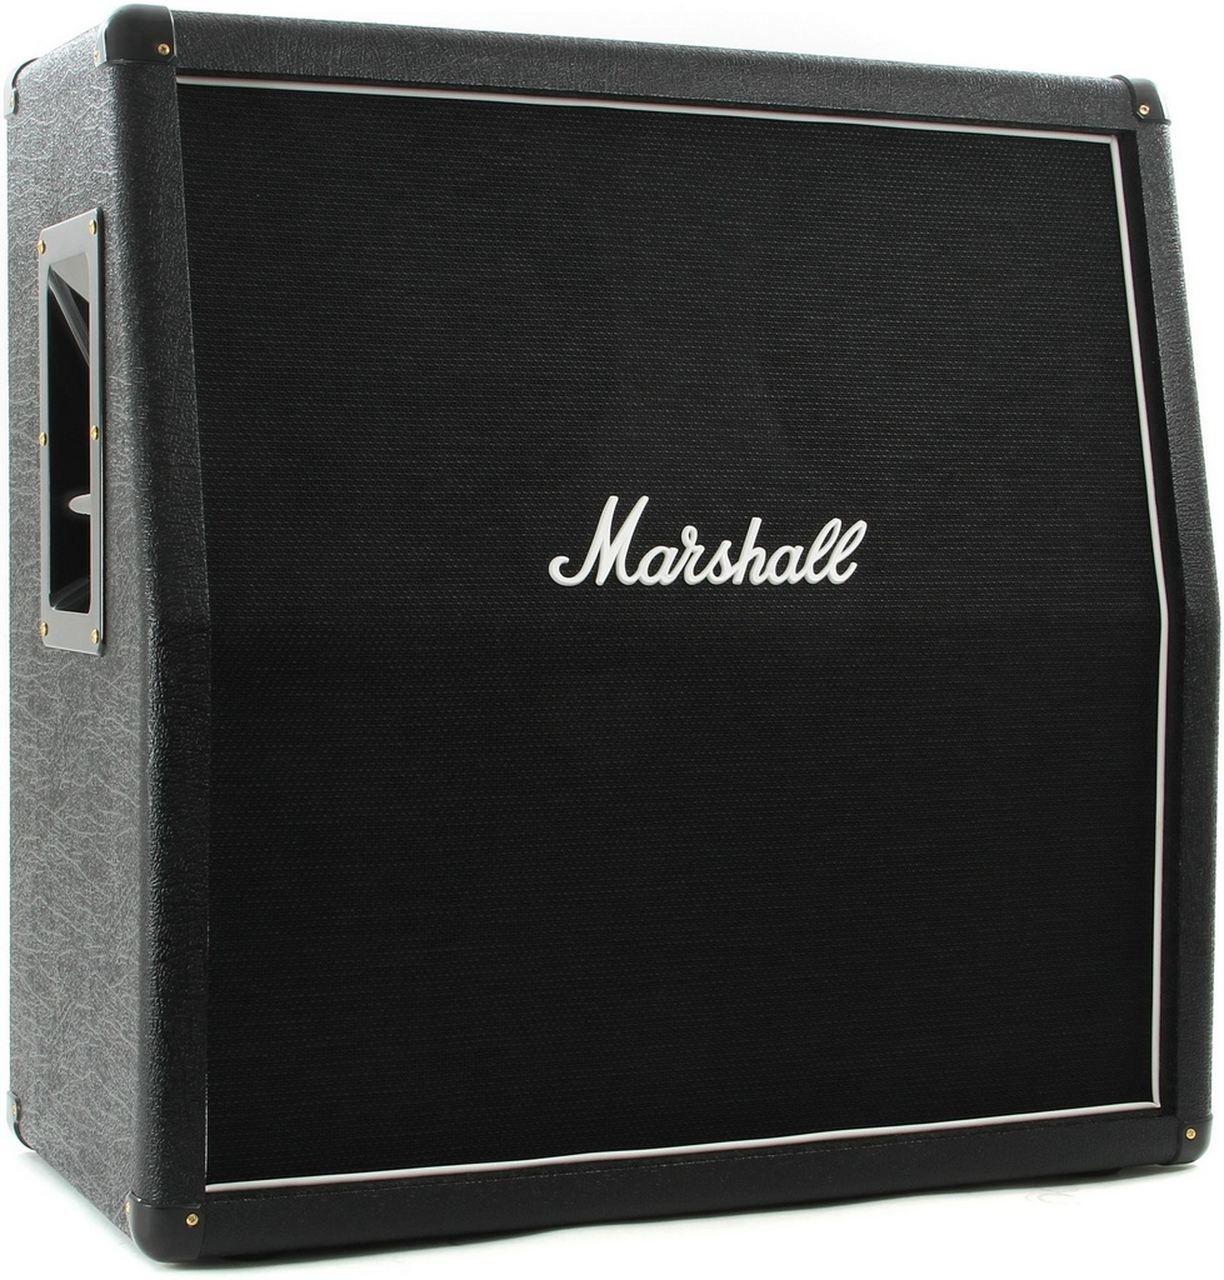 Gabinete Marshall MX412A 240W 4x12 Angulada para Guitarra